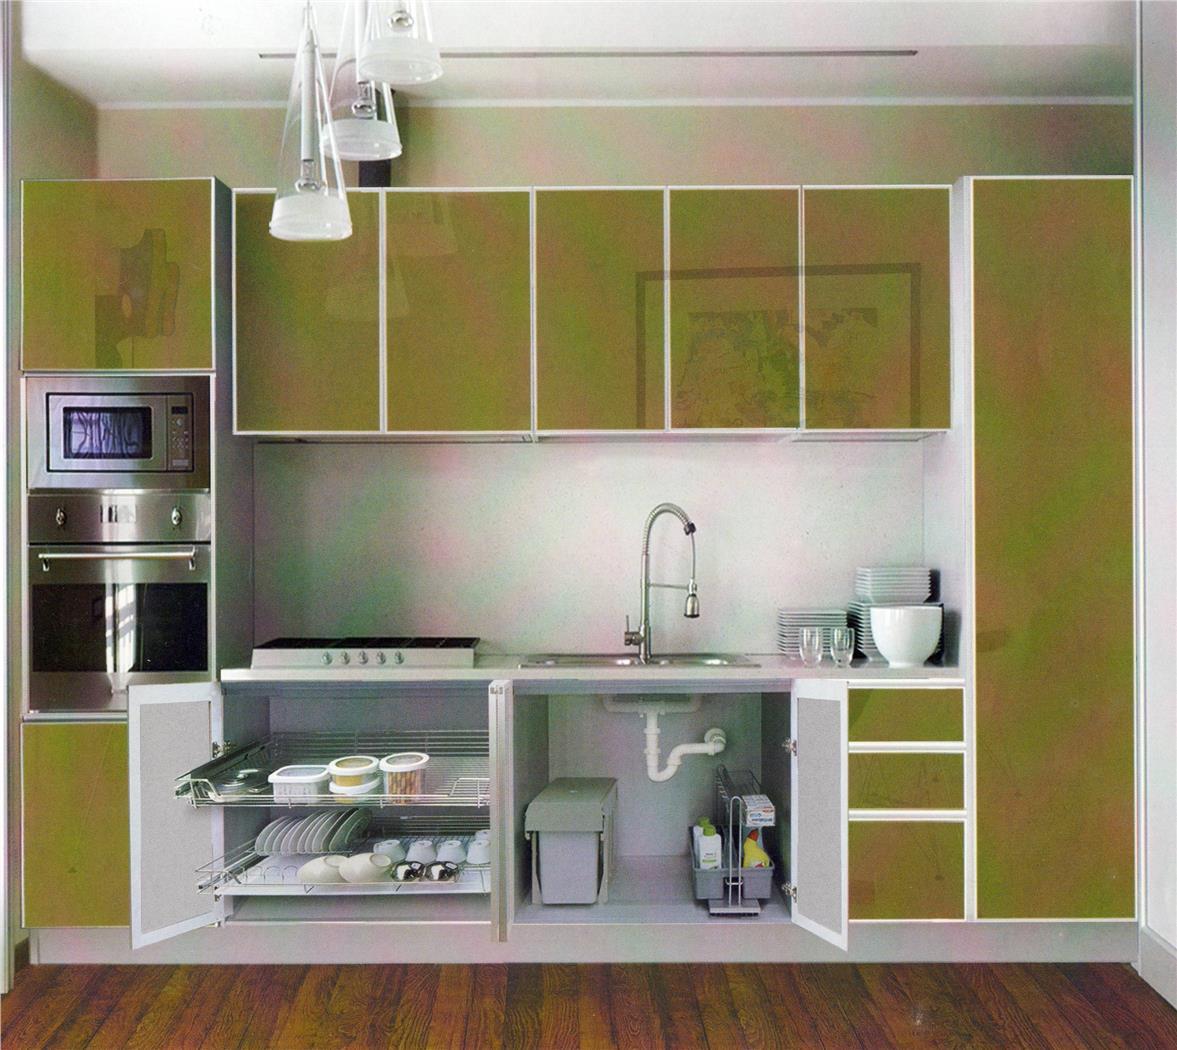 Subang Jaya Kitchen Cabinet: Kitchen Cabi (Selangor) End Time 4/25/2020 3:15 PM Lelong.my